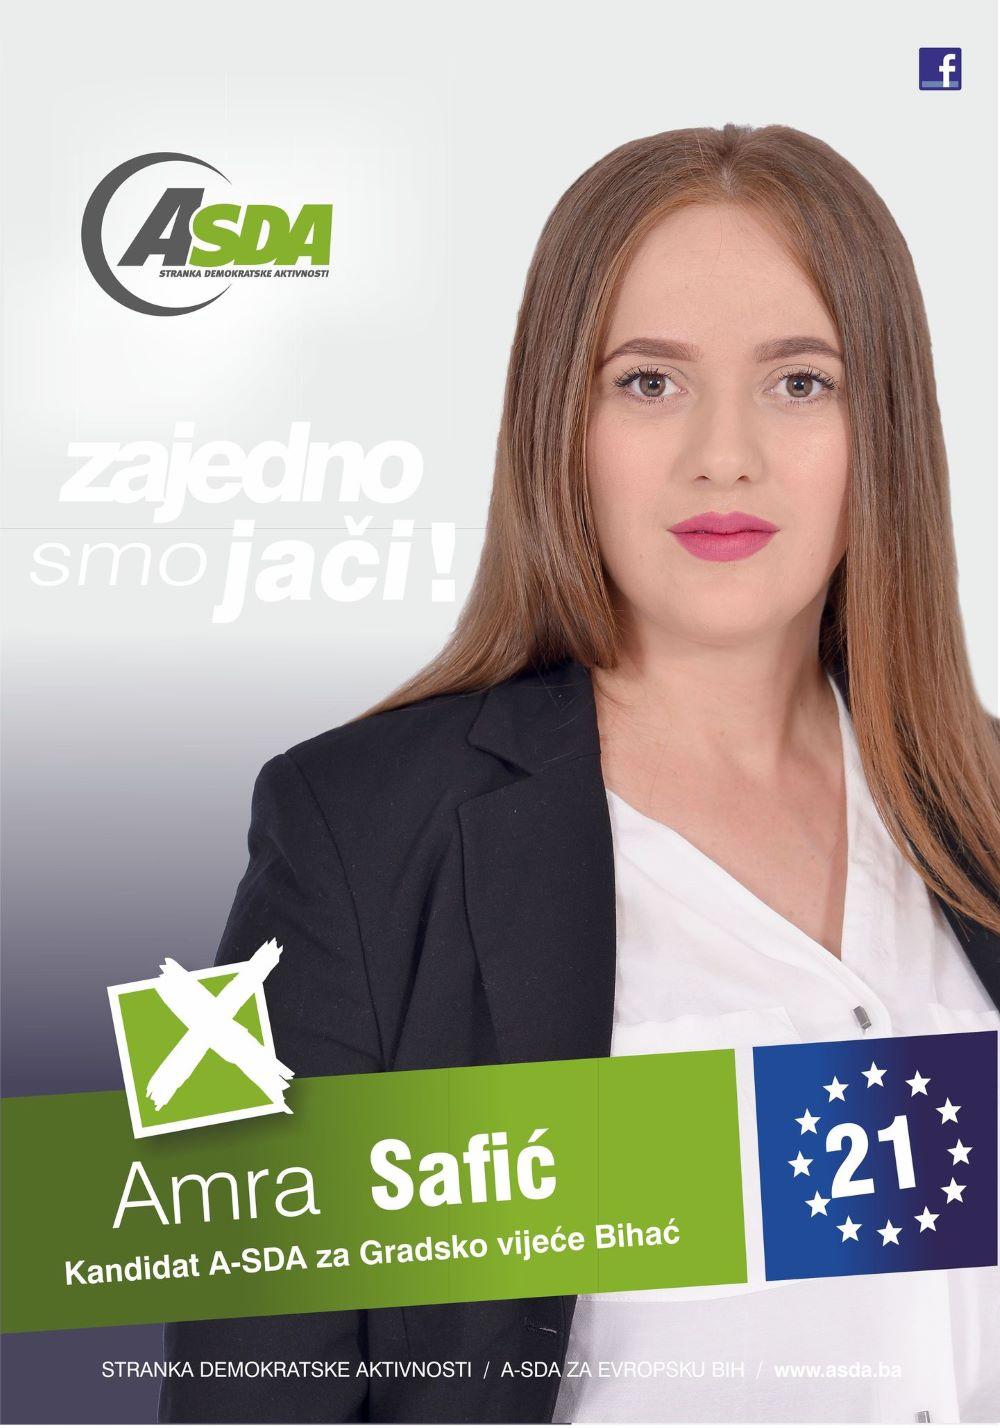 Amra Safić